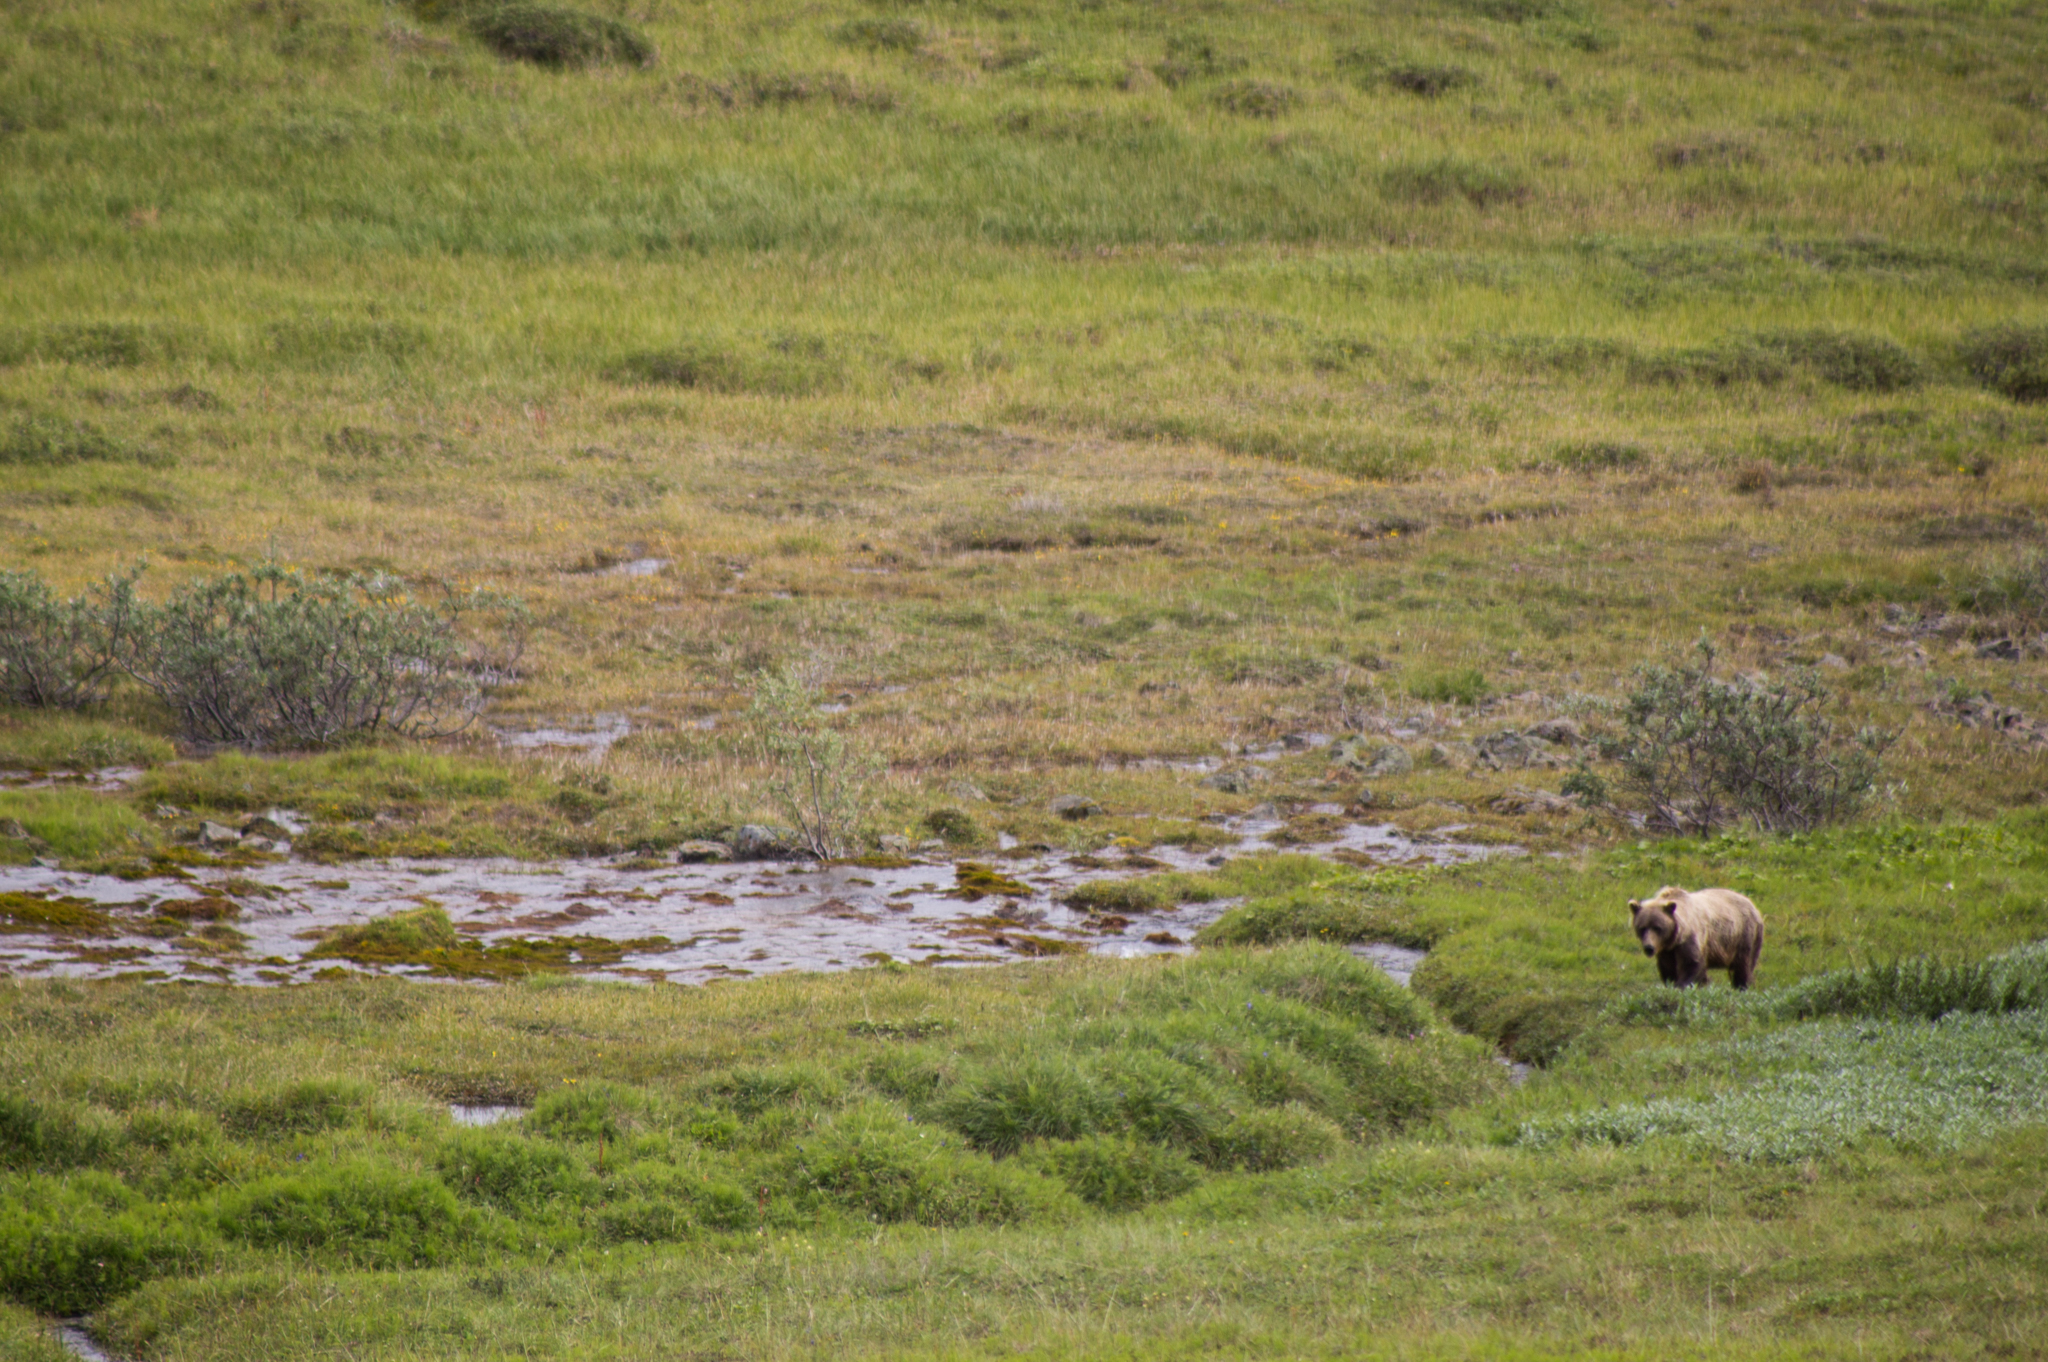 Danali National Park - Brown Bear Sighting